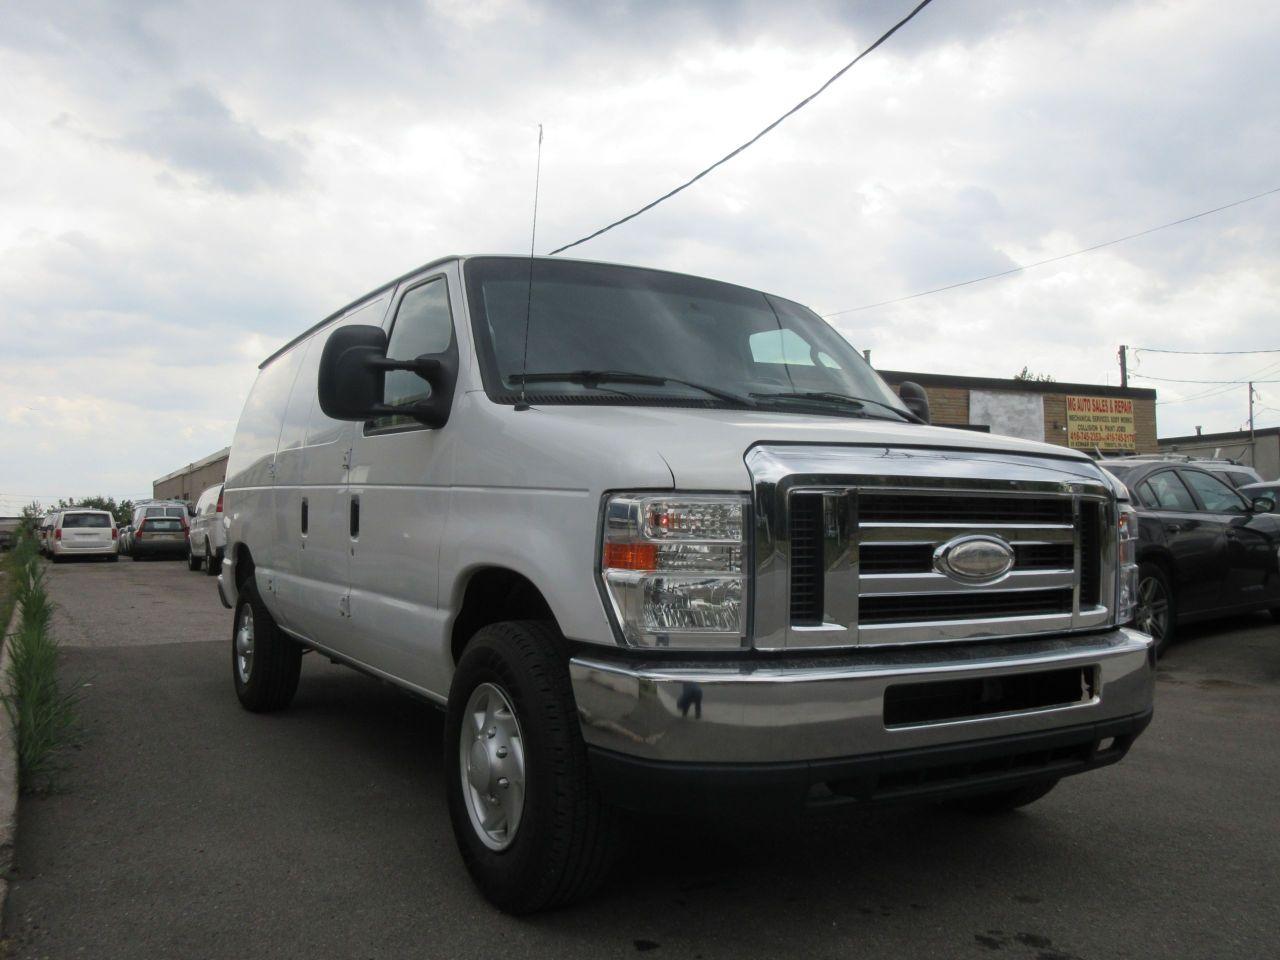 Mirage Auto Sales >> 2014 Ford Econoline Mirage Automotive Sales Service Inc